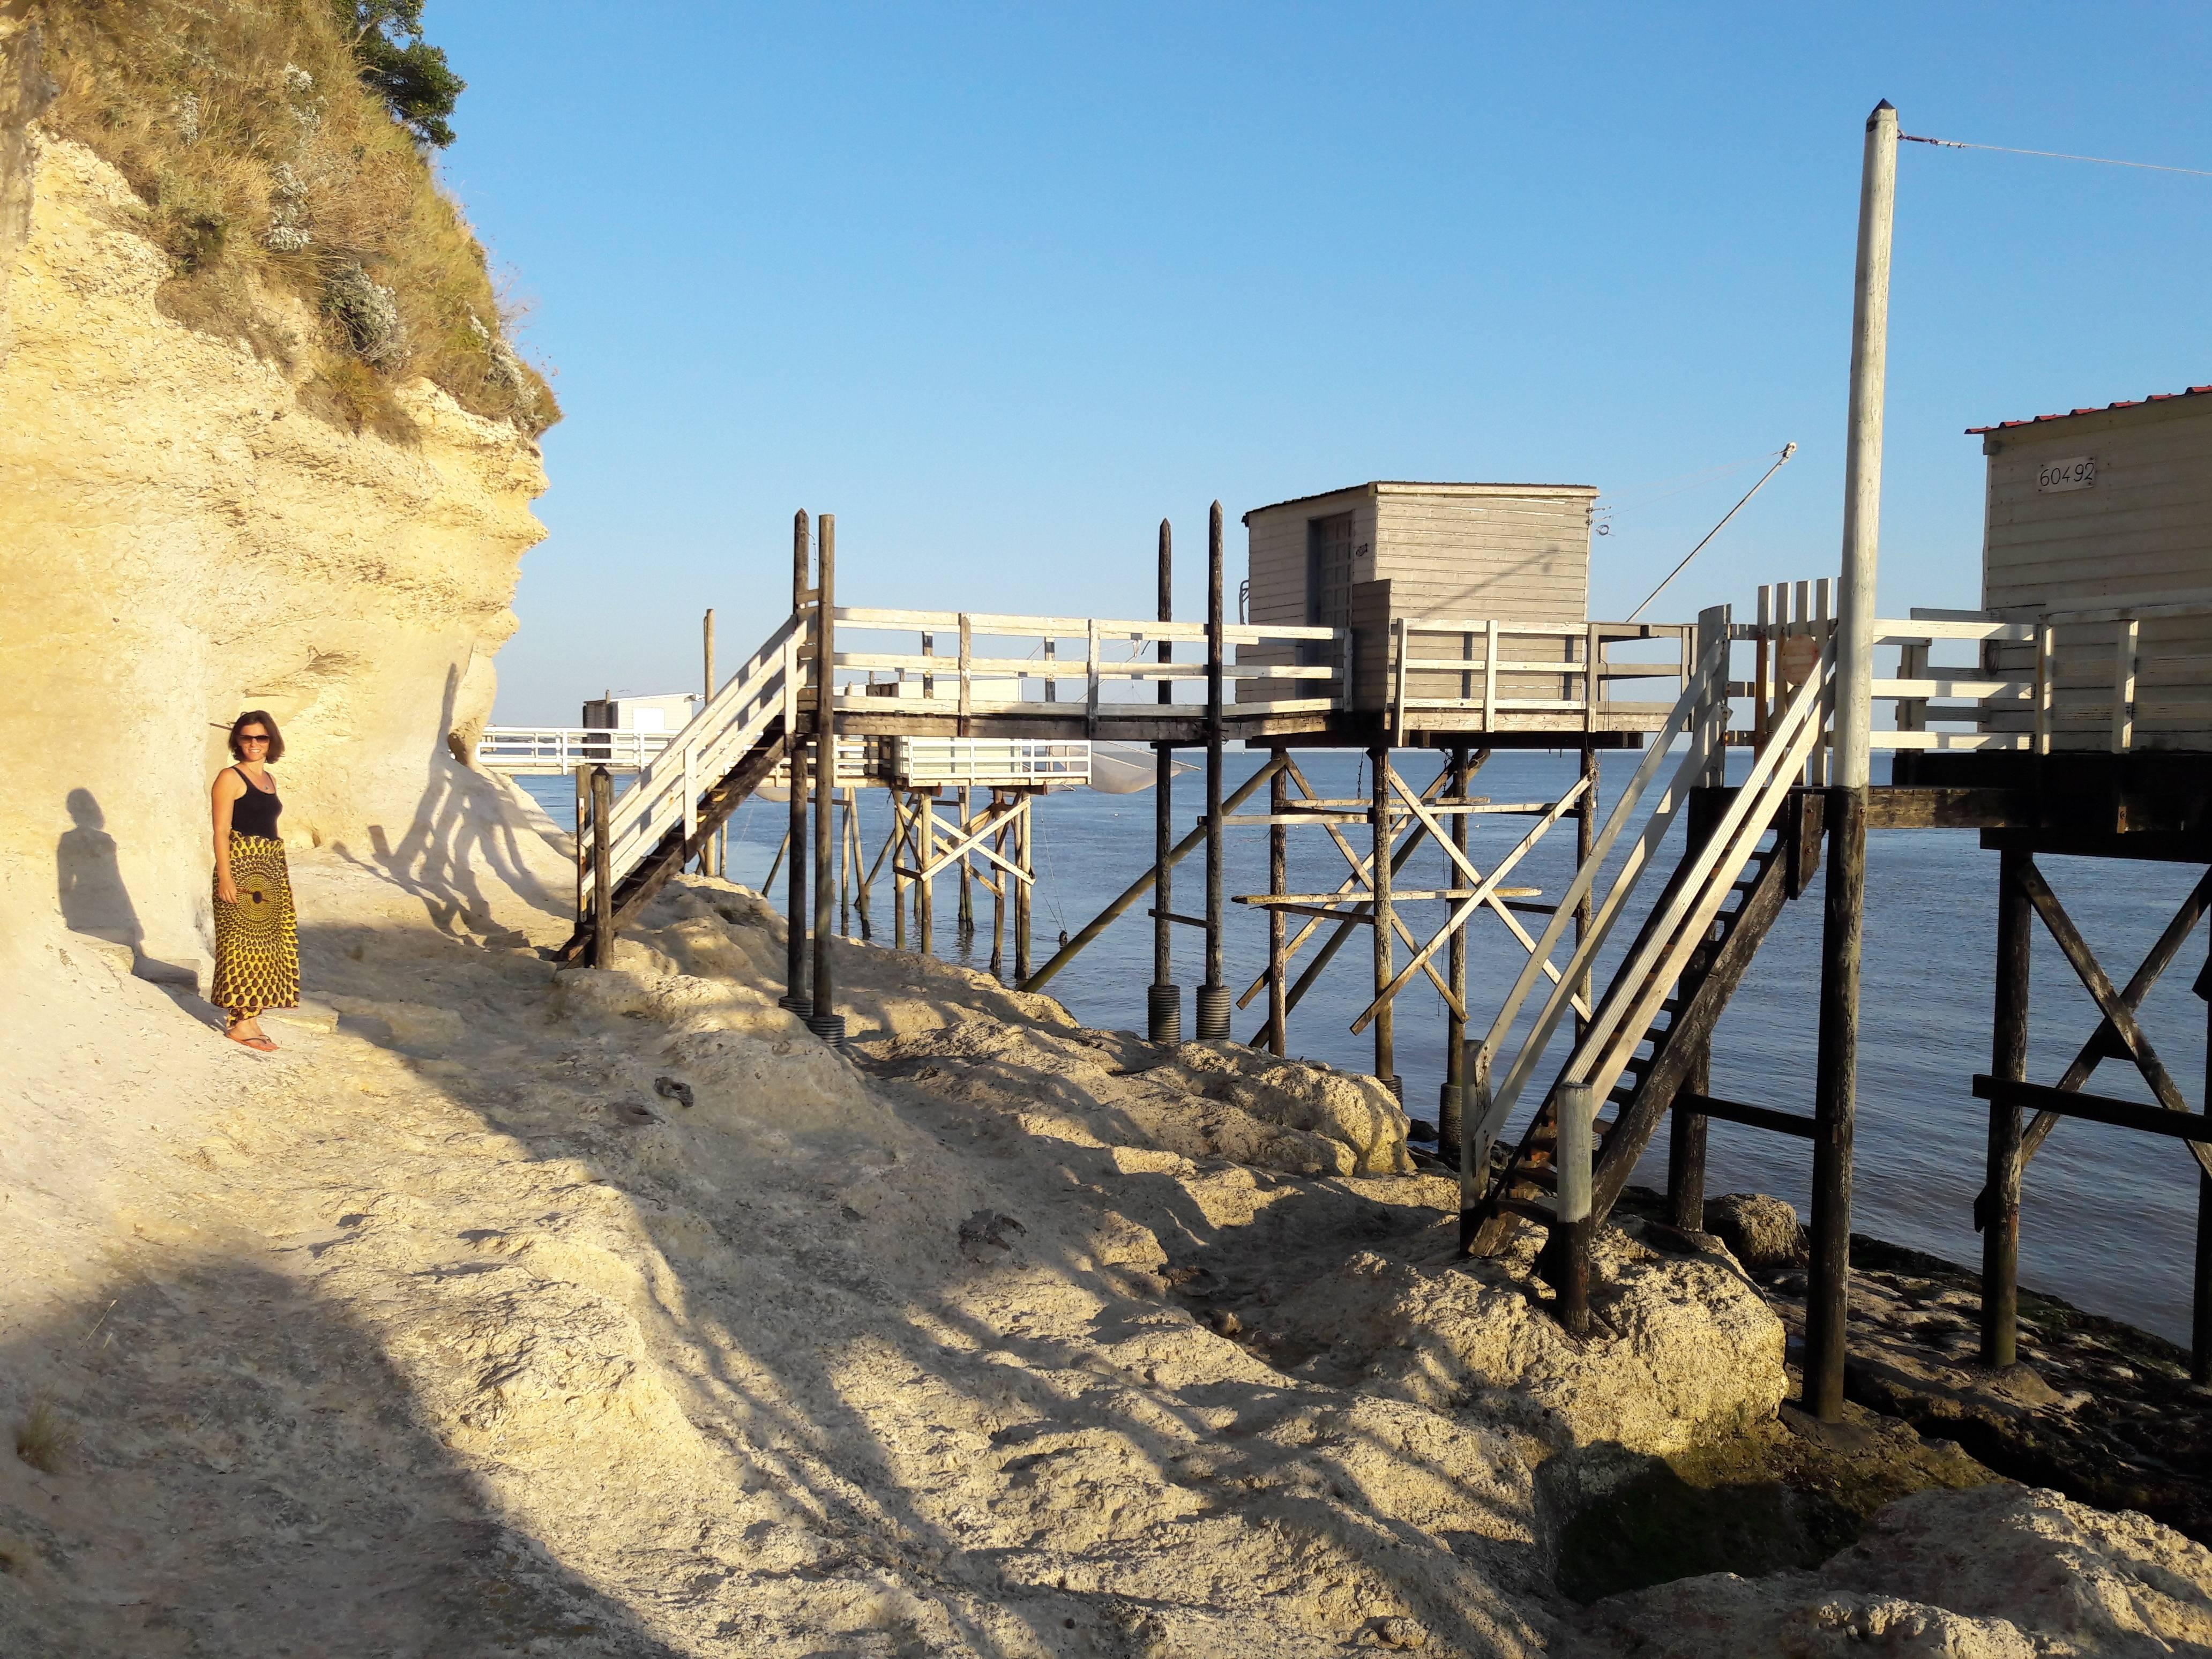 Photo 3: Balade au pied des falaises de Meschers sur Gironde